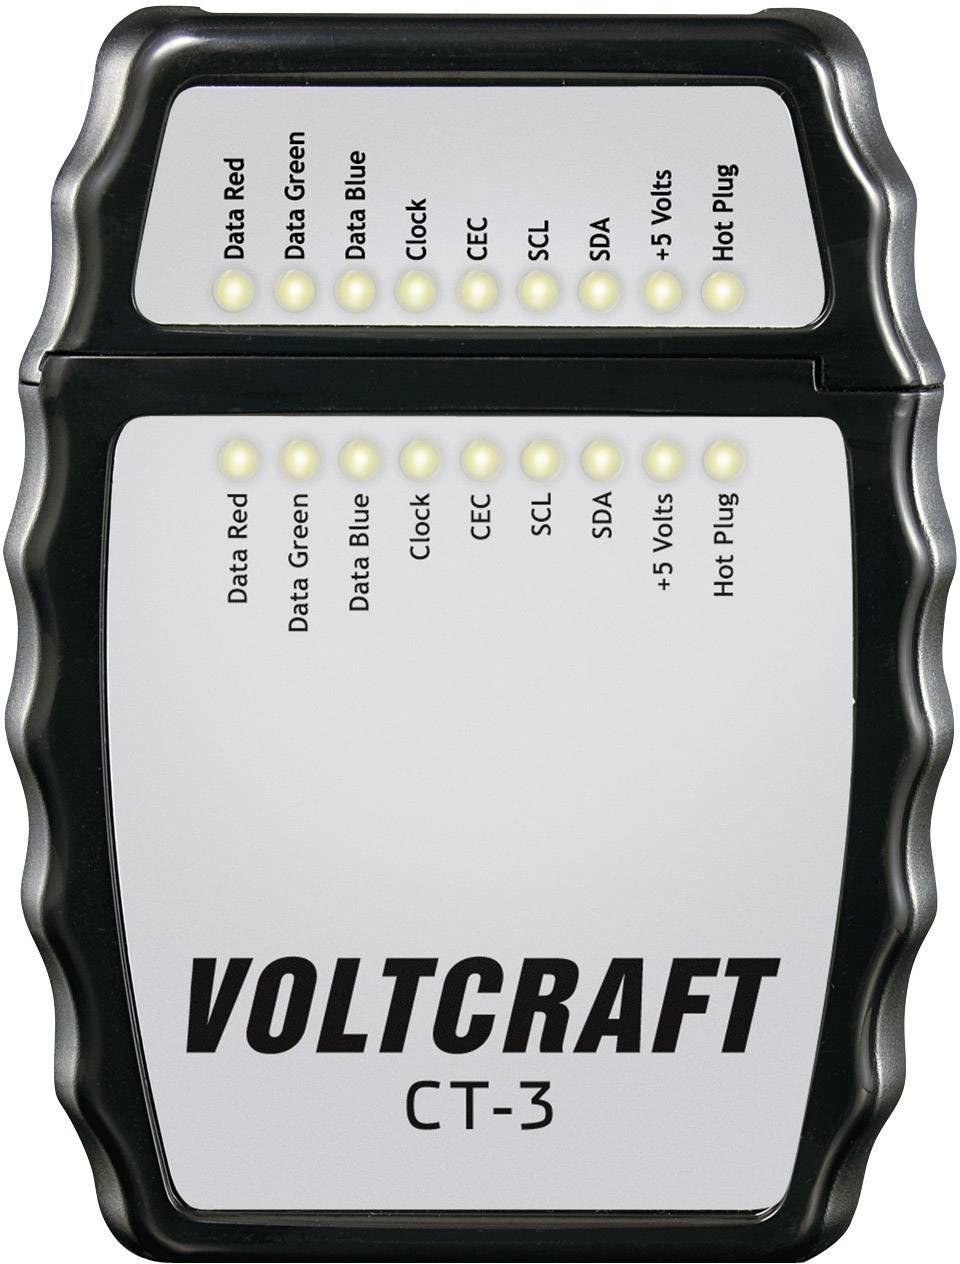 VOLTCRAFT CT-3 HDMI-kabeltester Geschikt voor HDMI-kabel type A ...